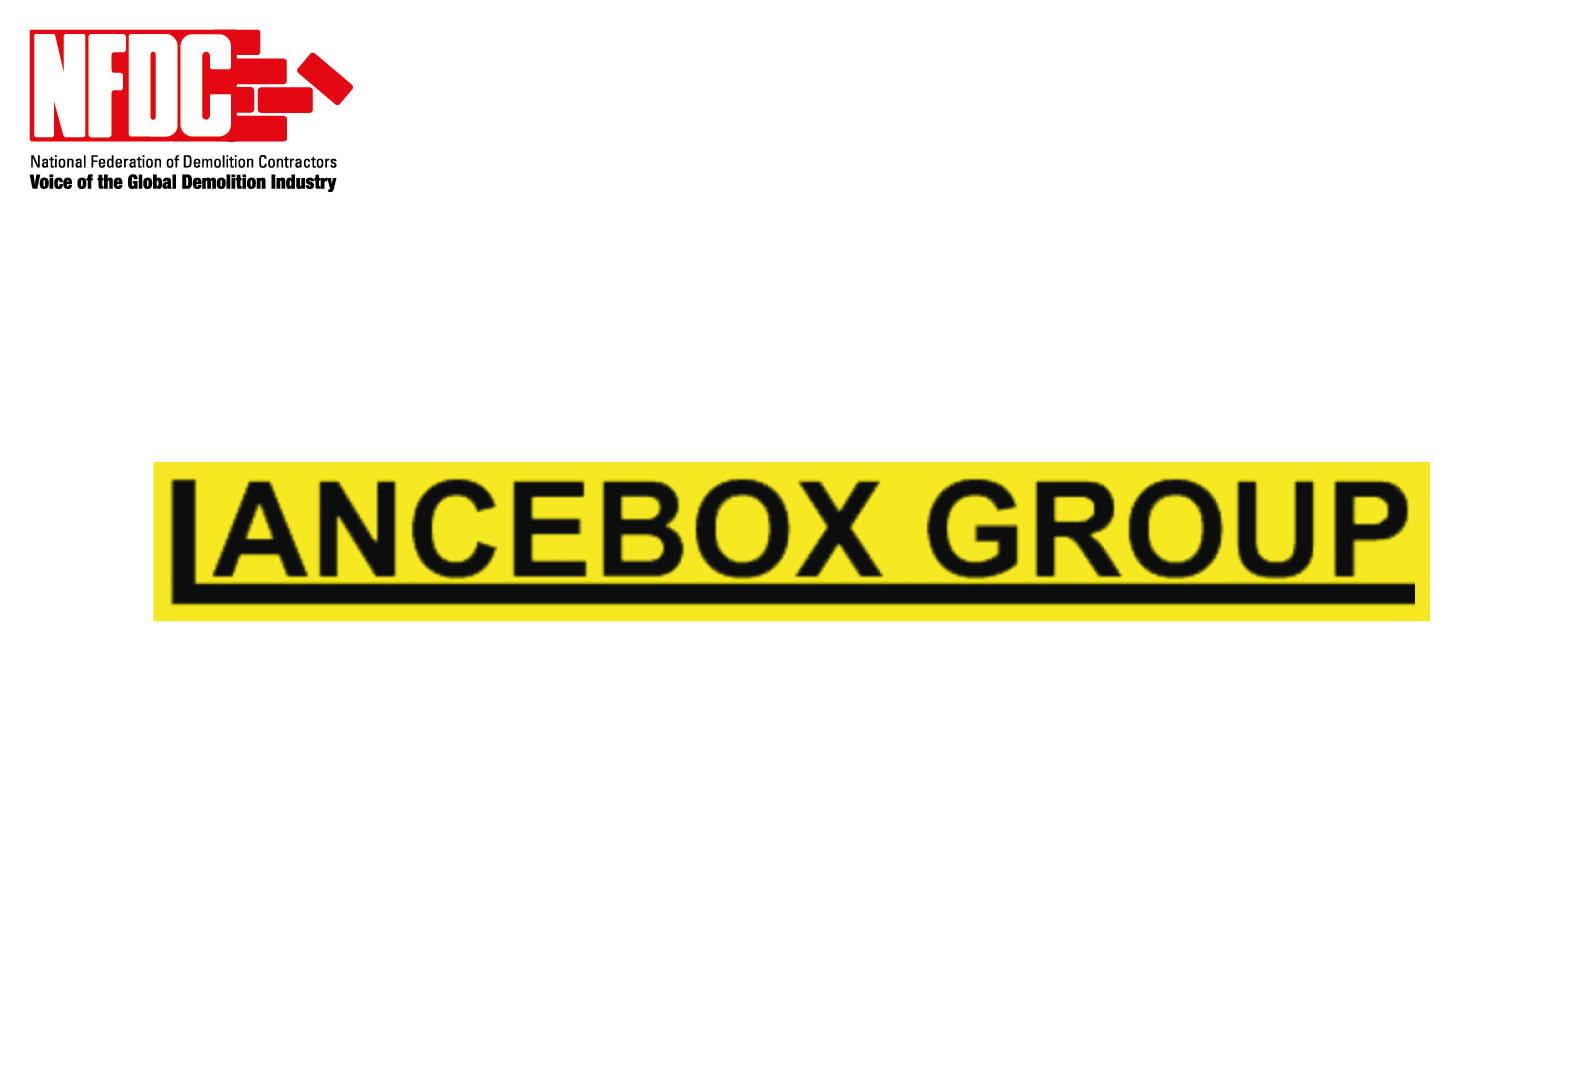 Lancebox